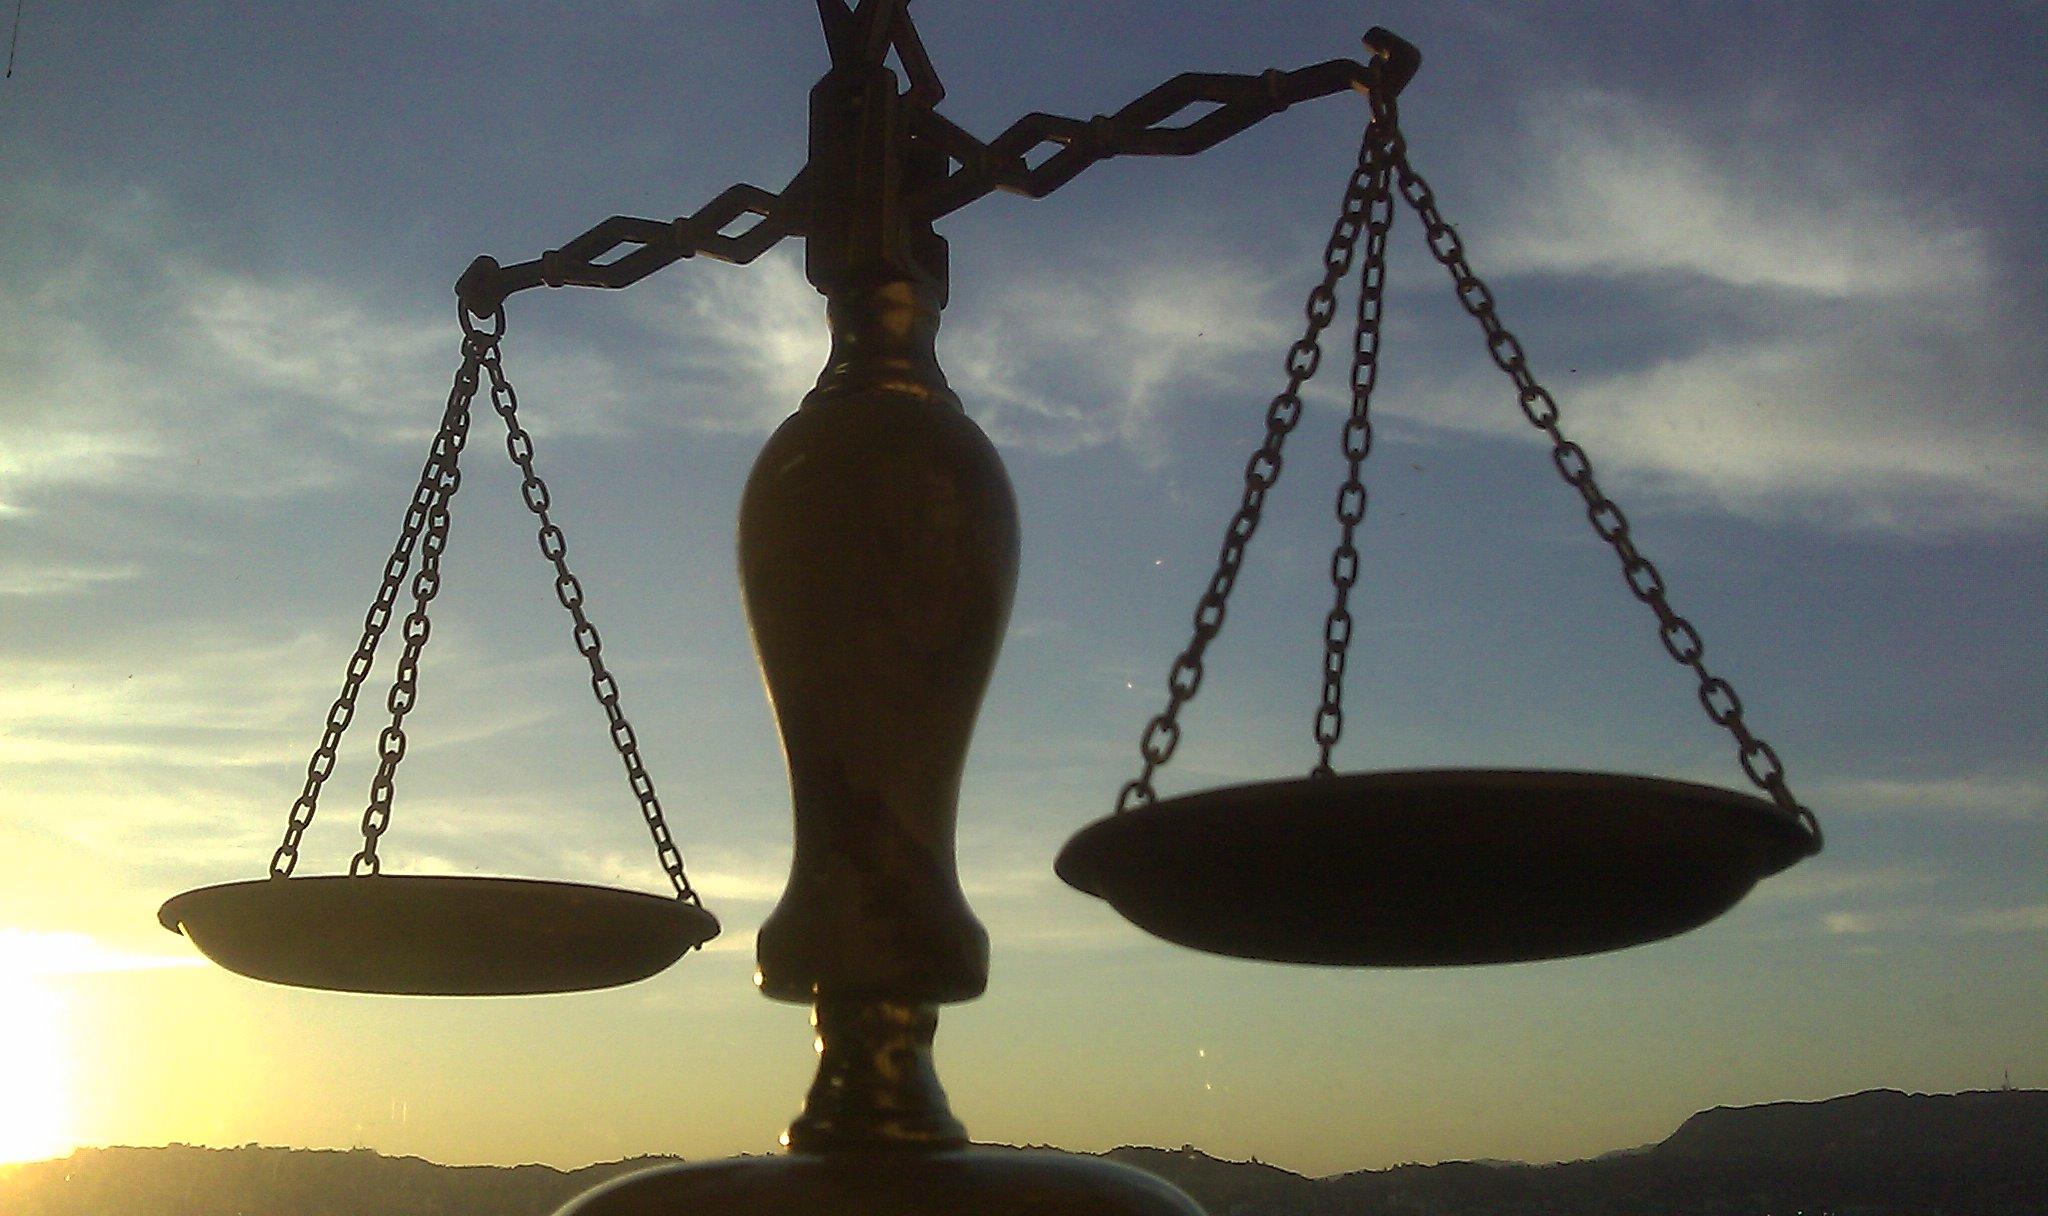 https://i0.wp.com/images.huffingtonpost.com/2014-07-18-scalesjustice.jpg